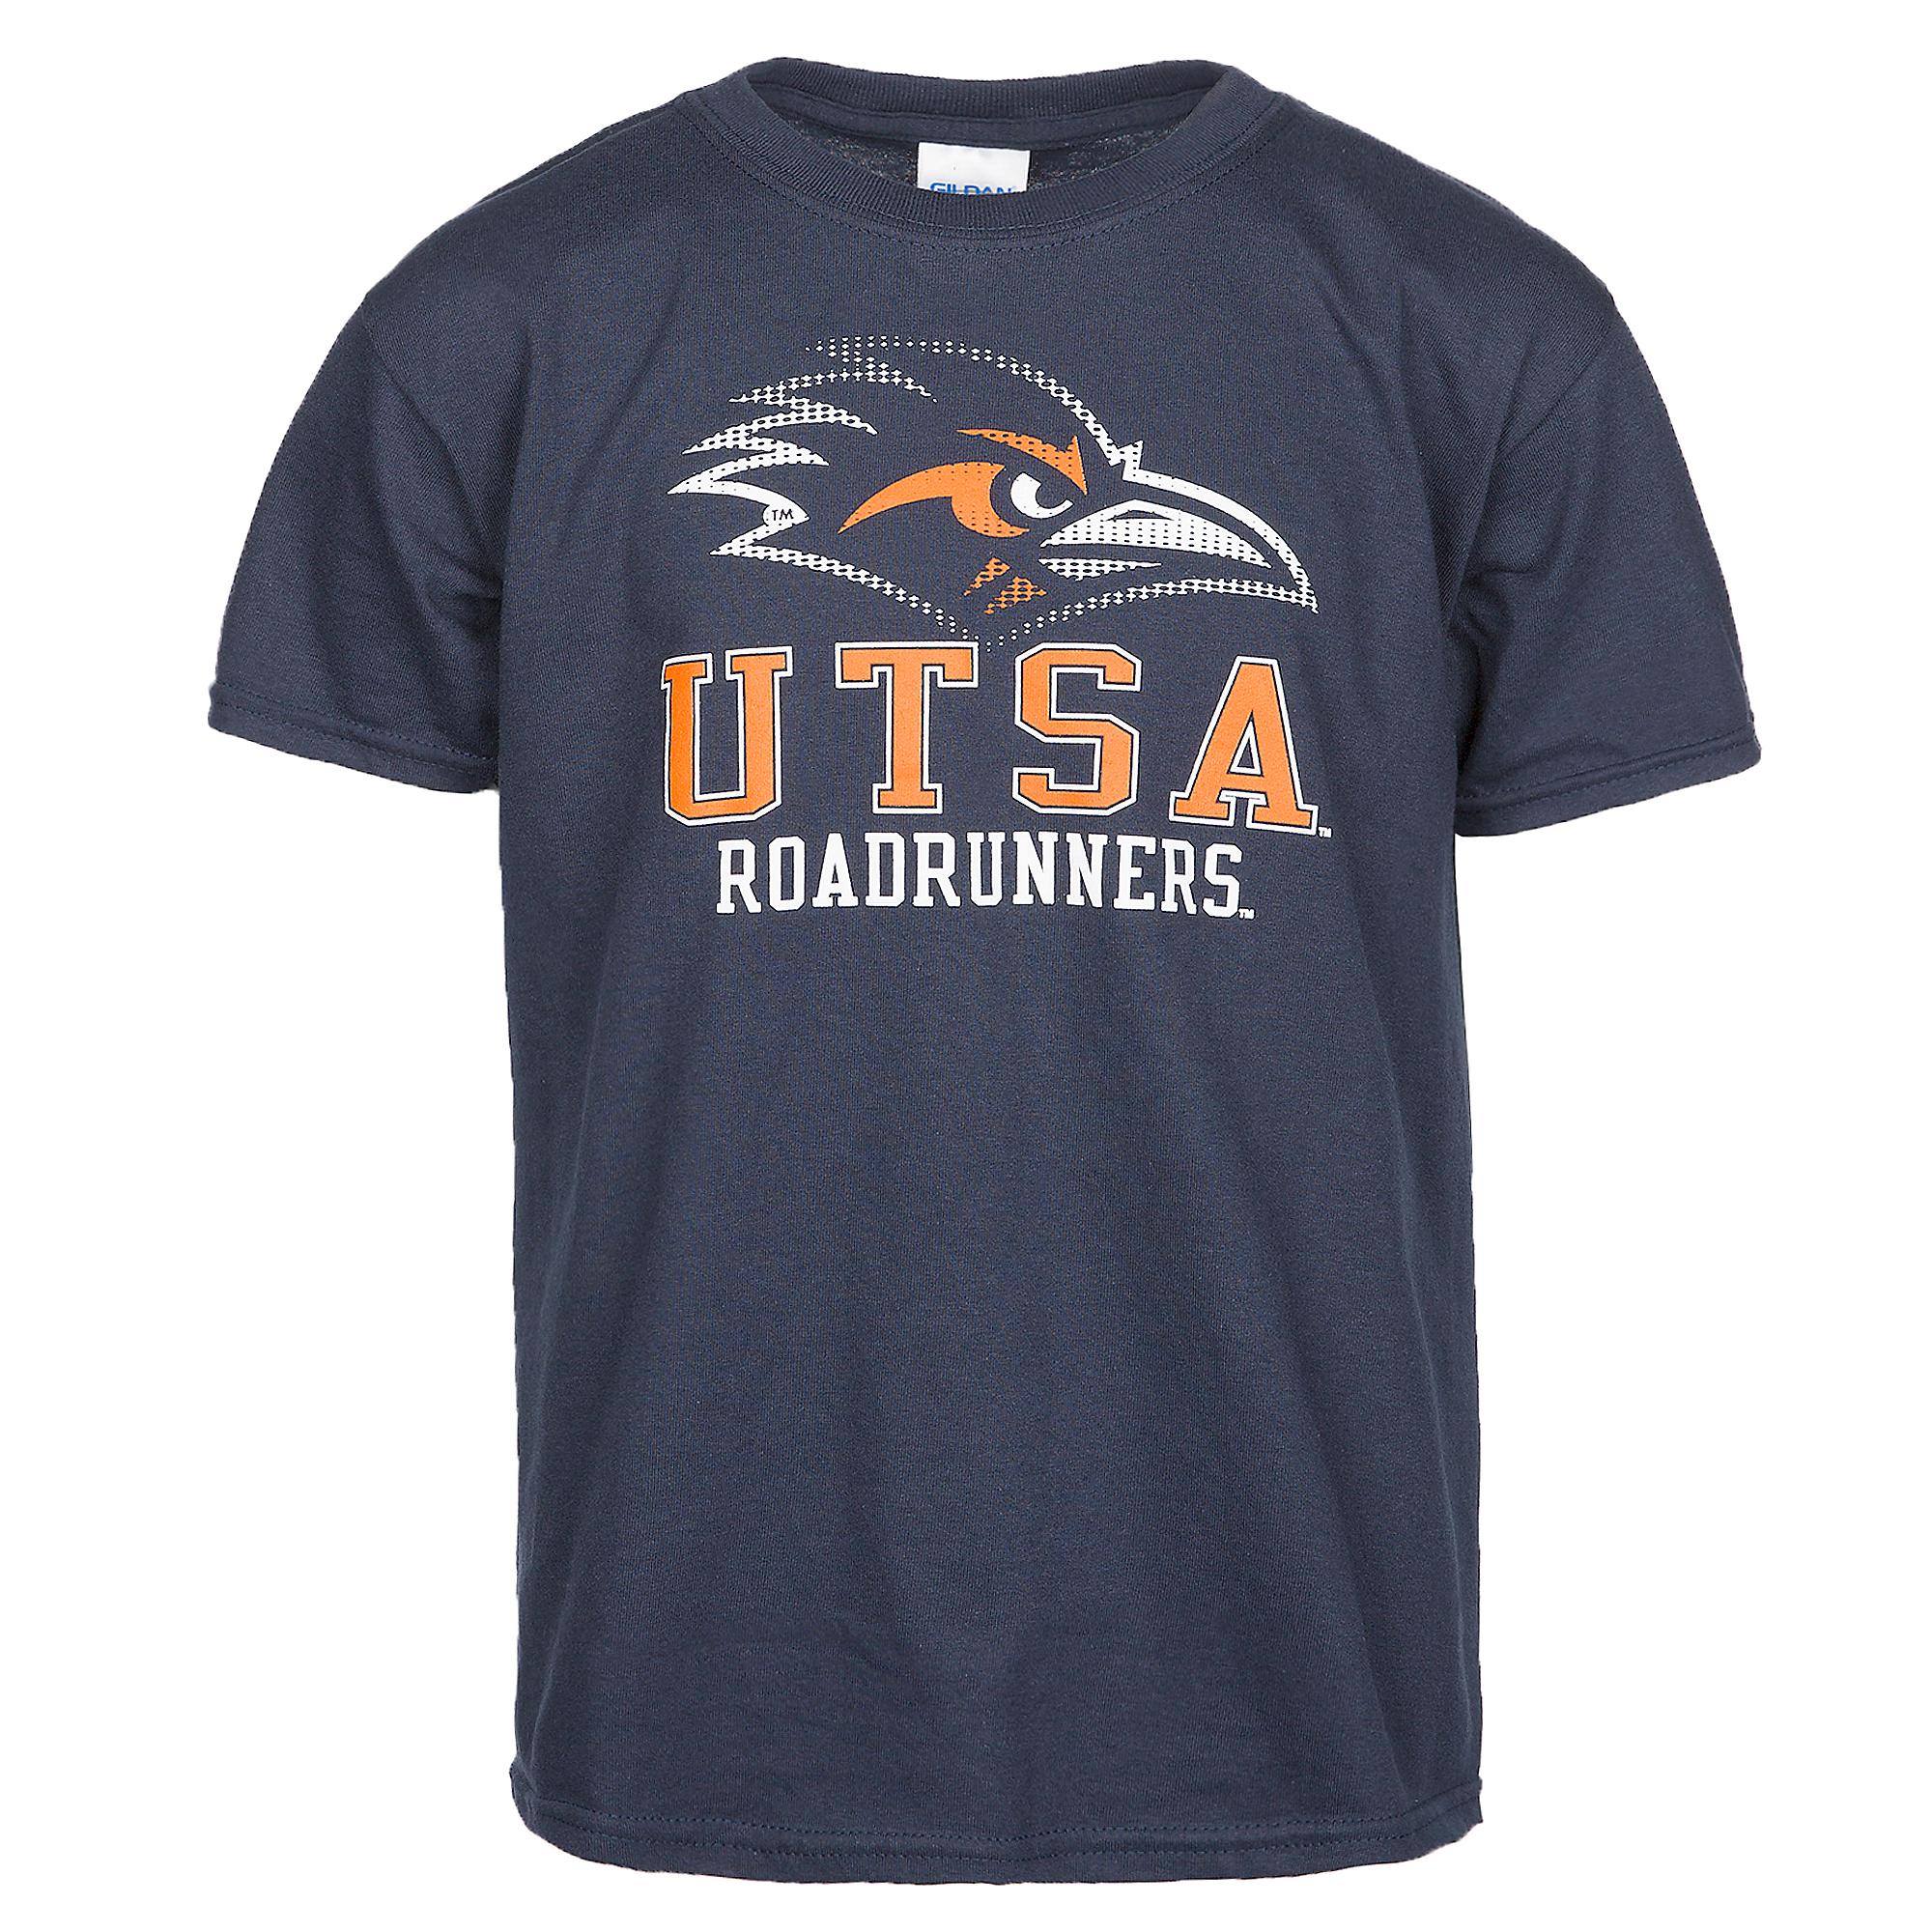 UTSA Roadrunners J.America Youth Mascot Tee